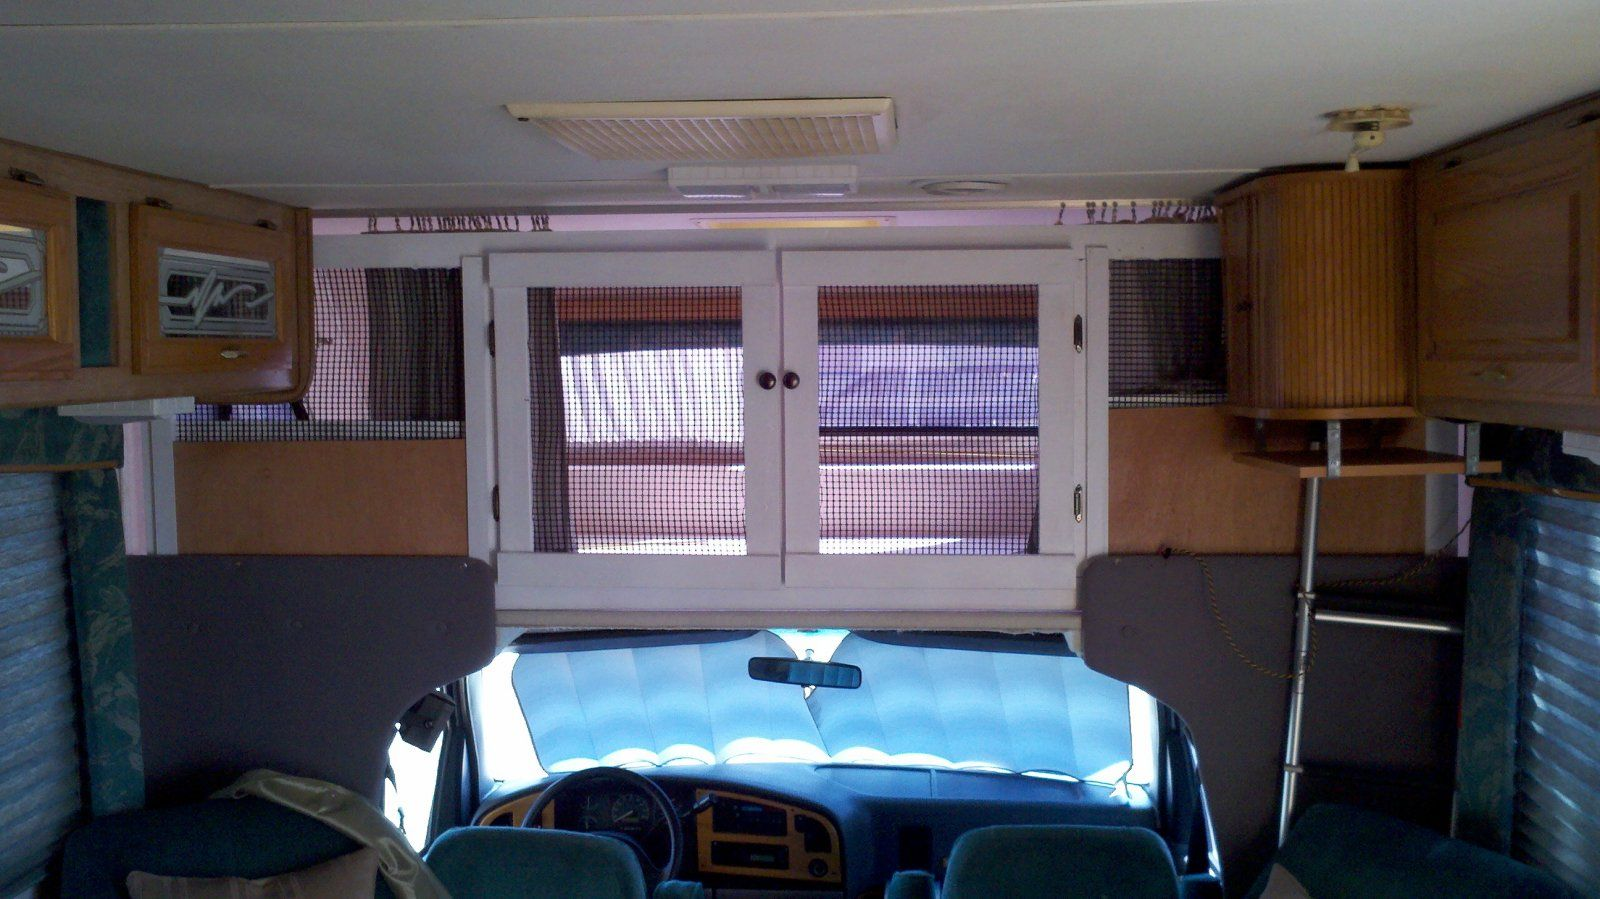 Rv curtains motorhome class a - Class C Rv Built In Cat Enclosure Http Www Irv2